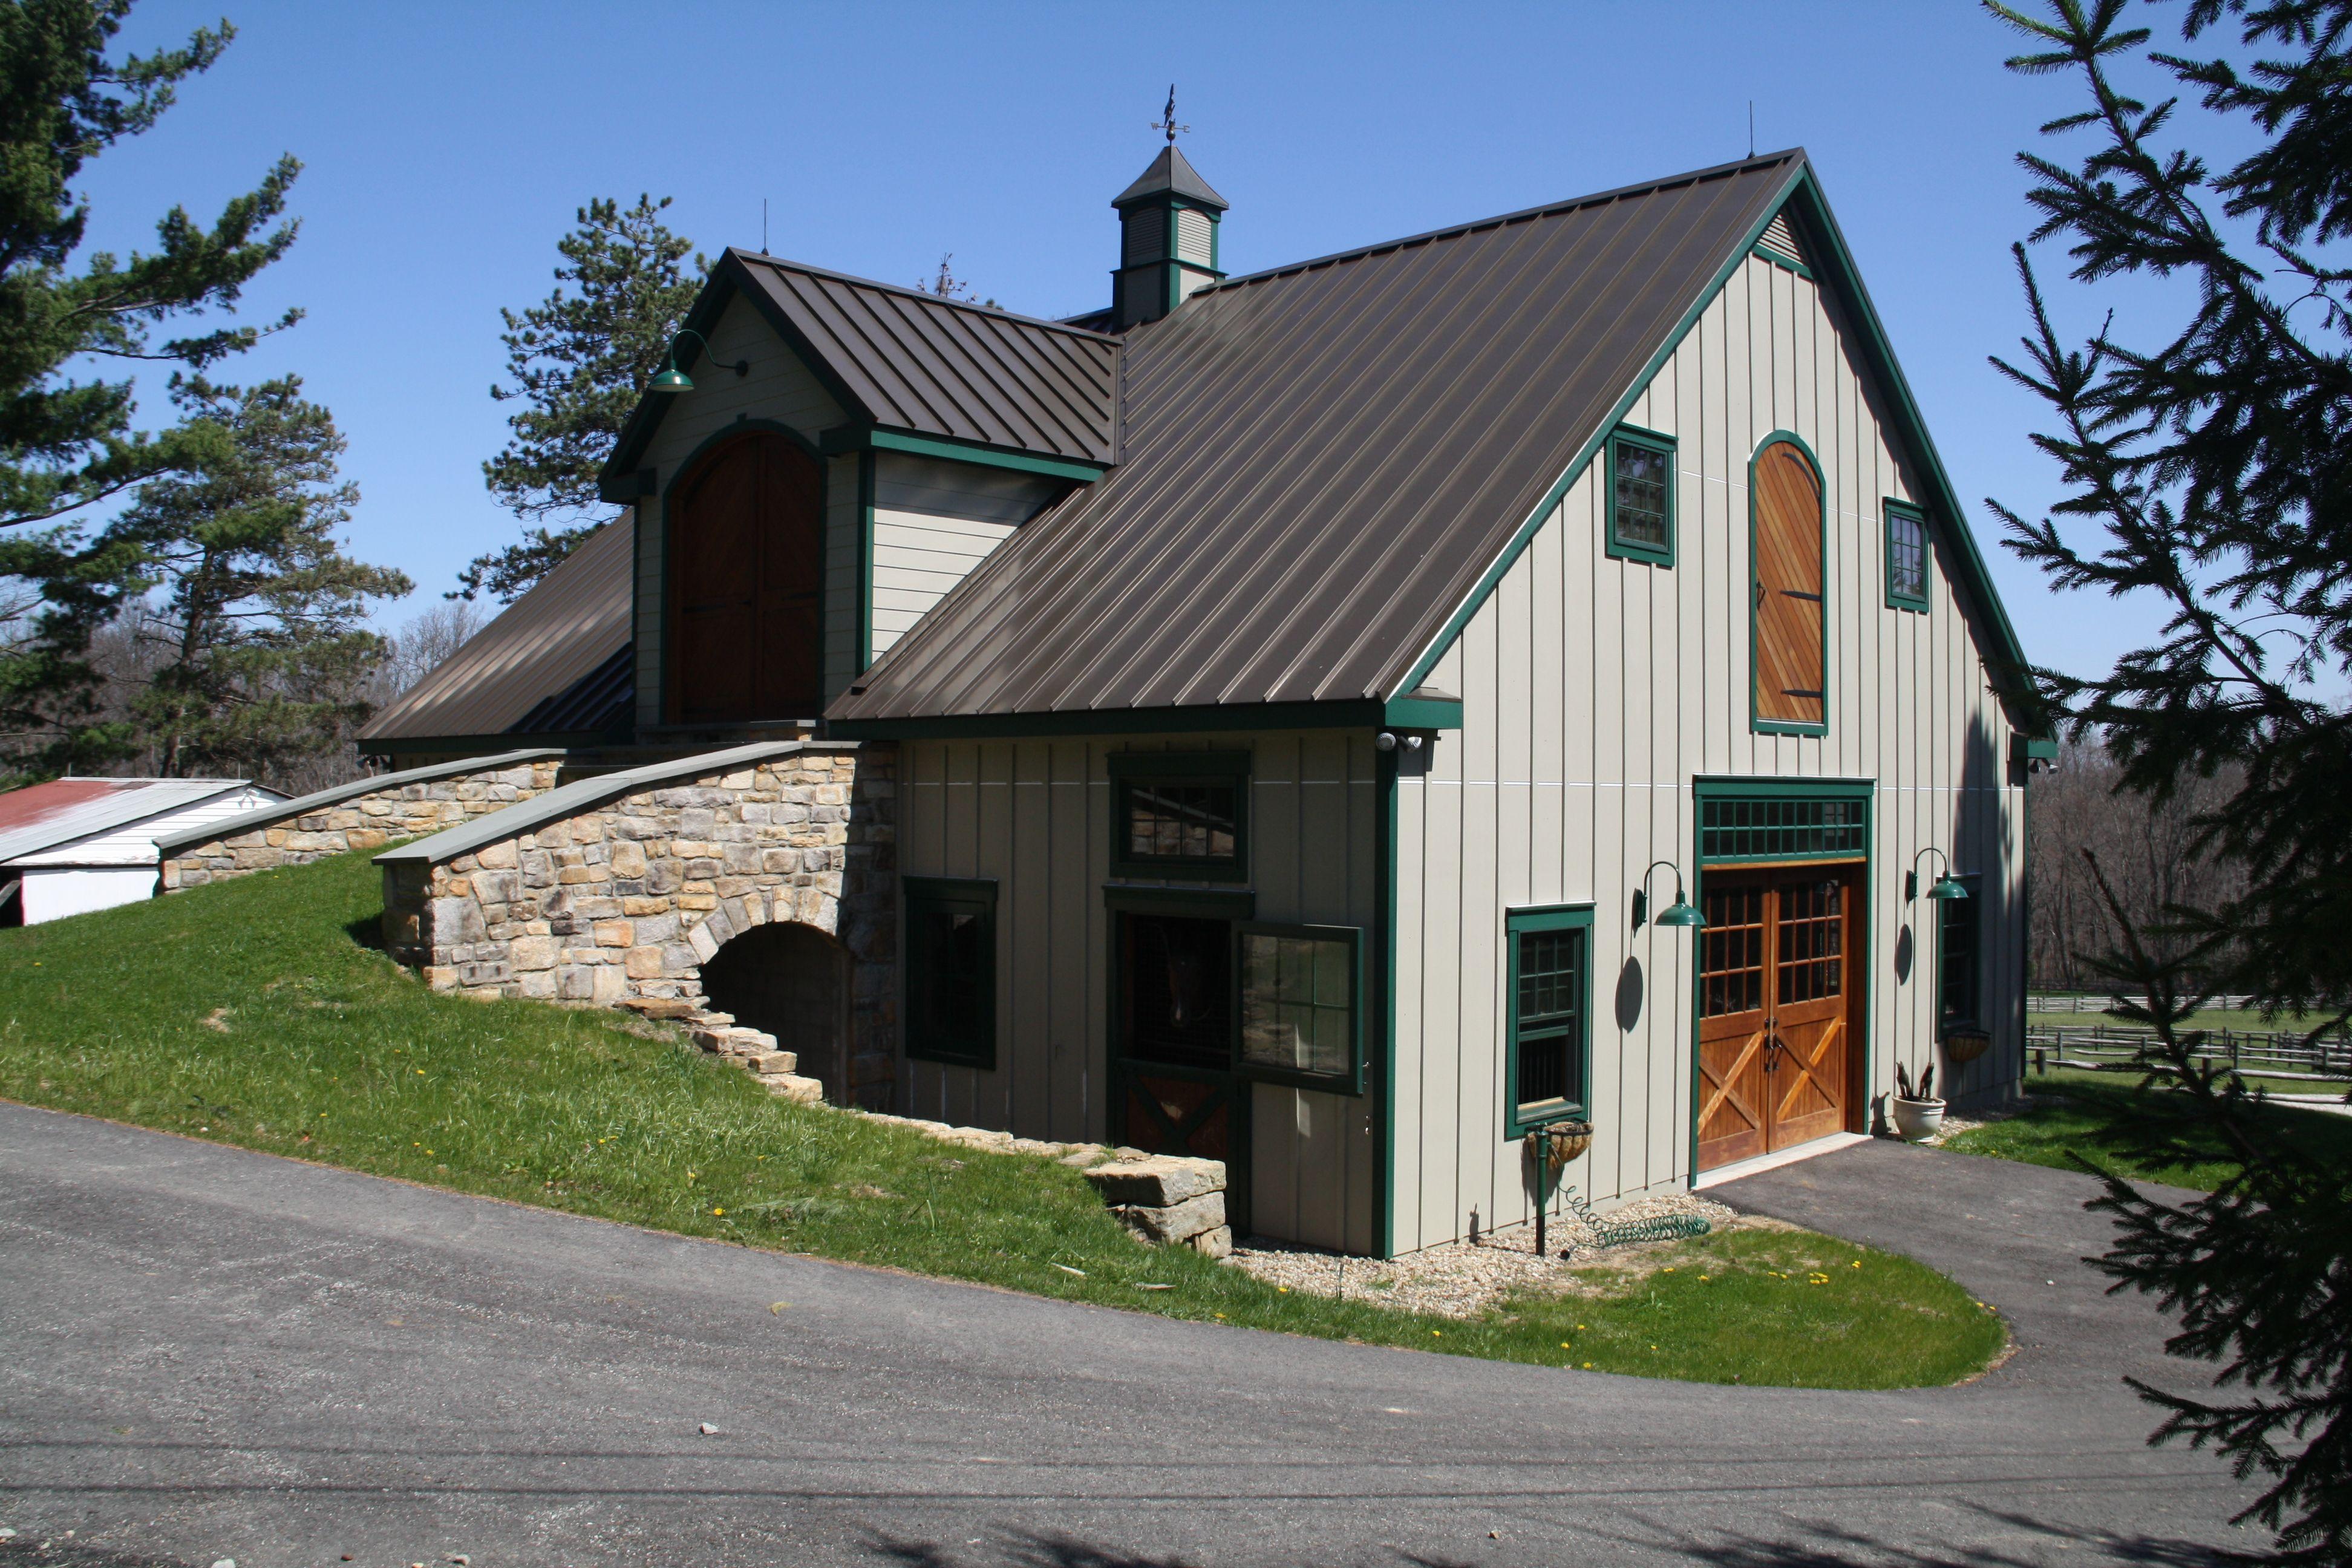 Bank barn | Bank barn, Barn house plans, Barn plans